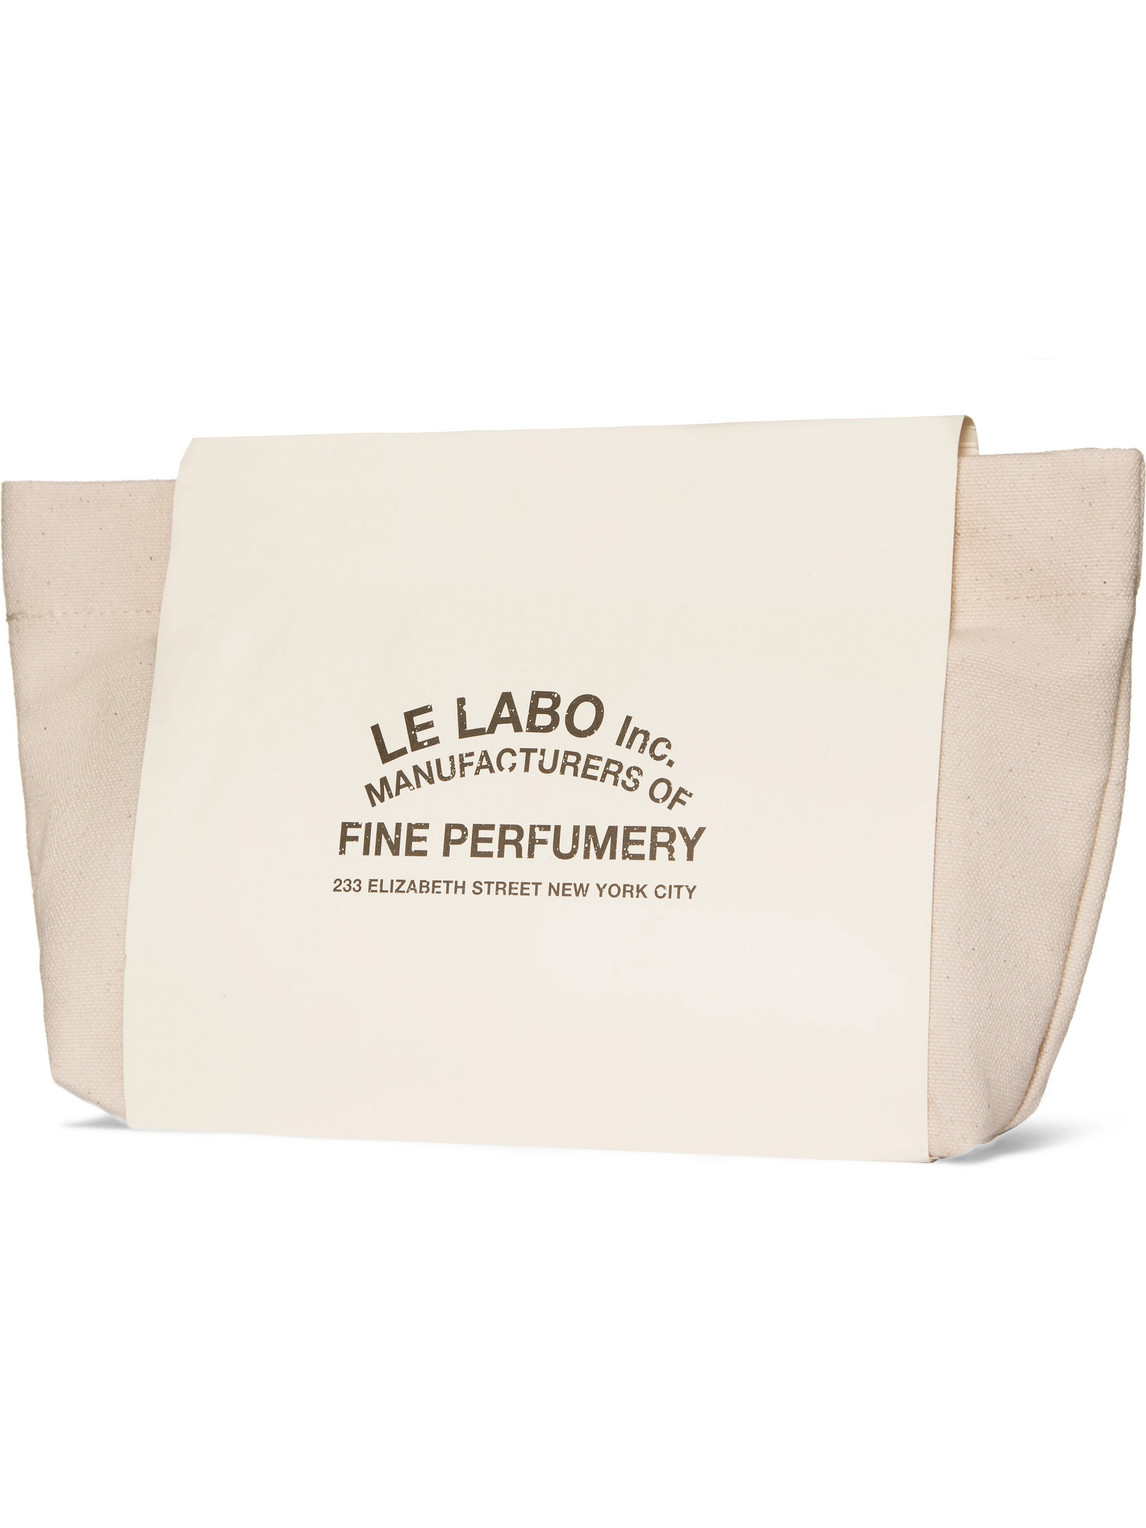 Le Labo HINOKI BODY & HAIR TRAVEL SET